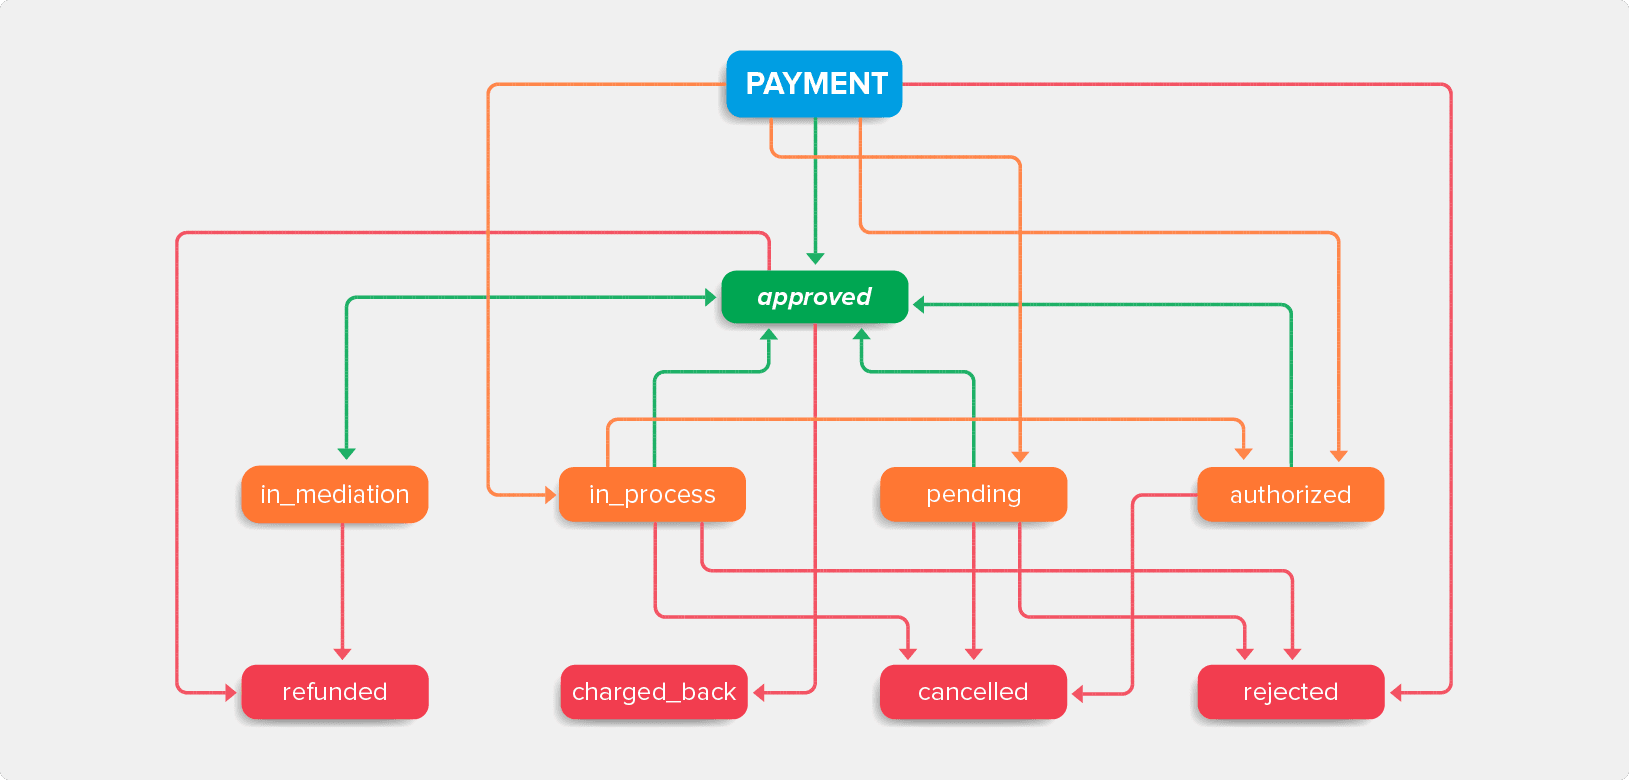 payment-status